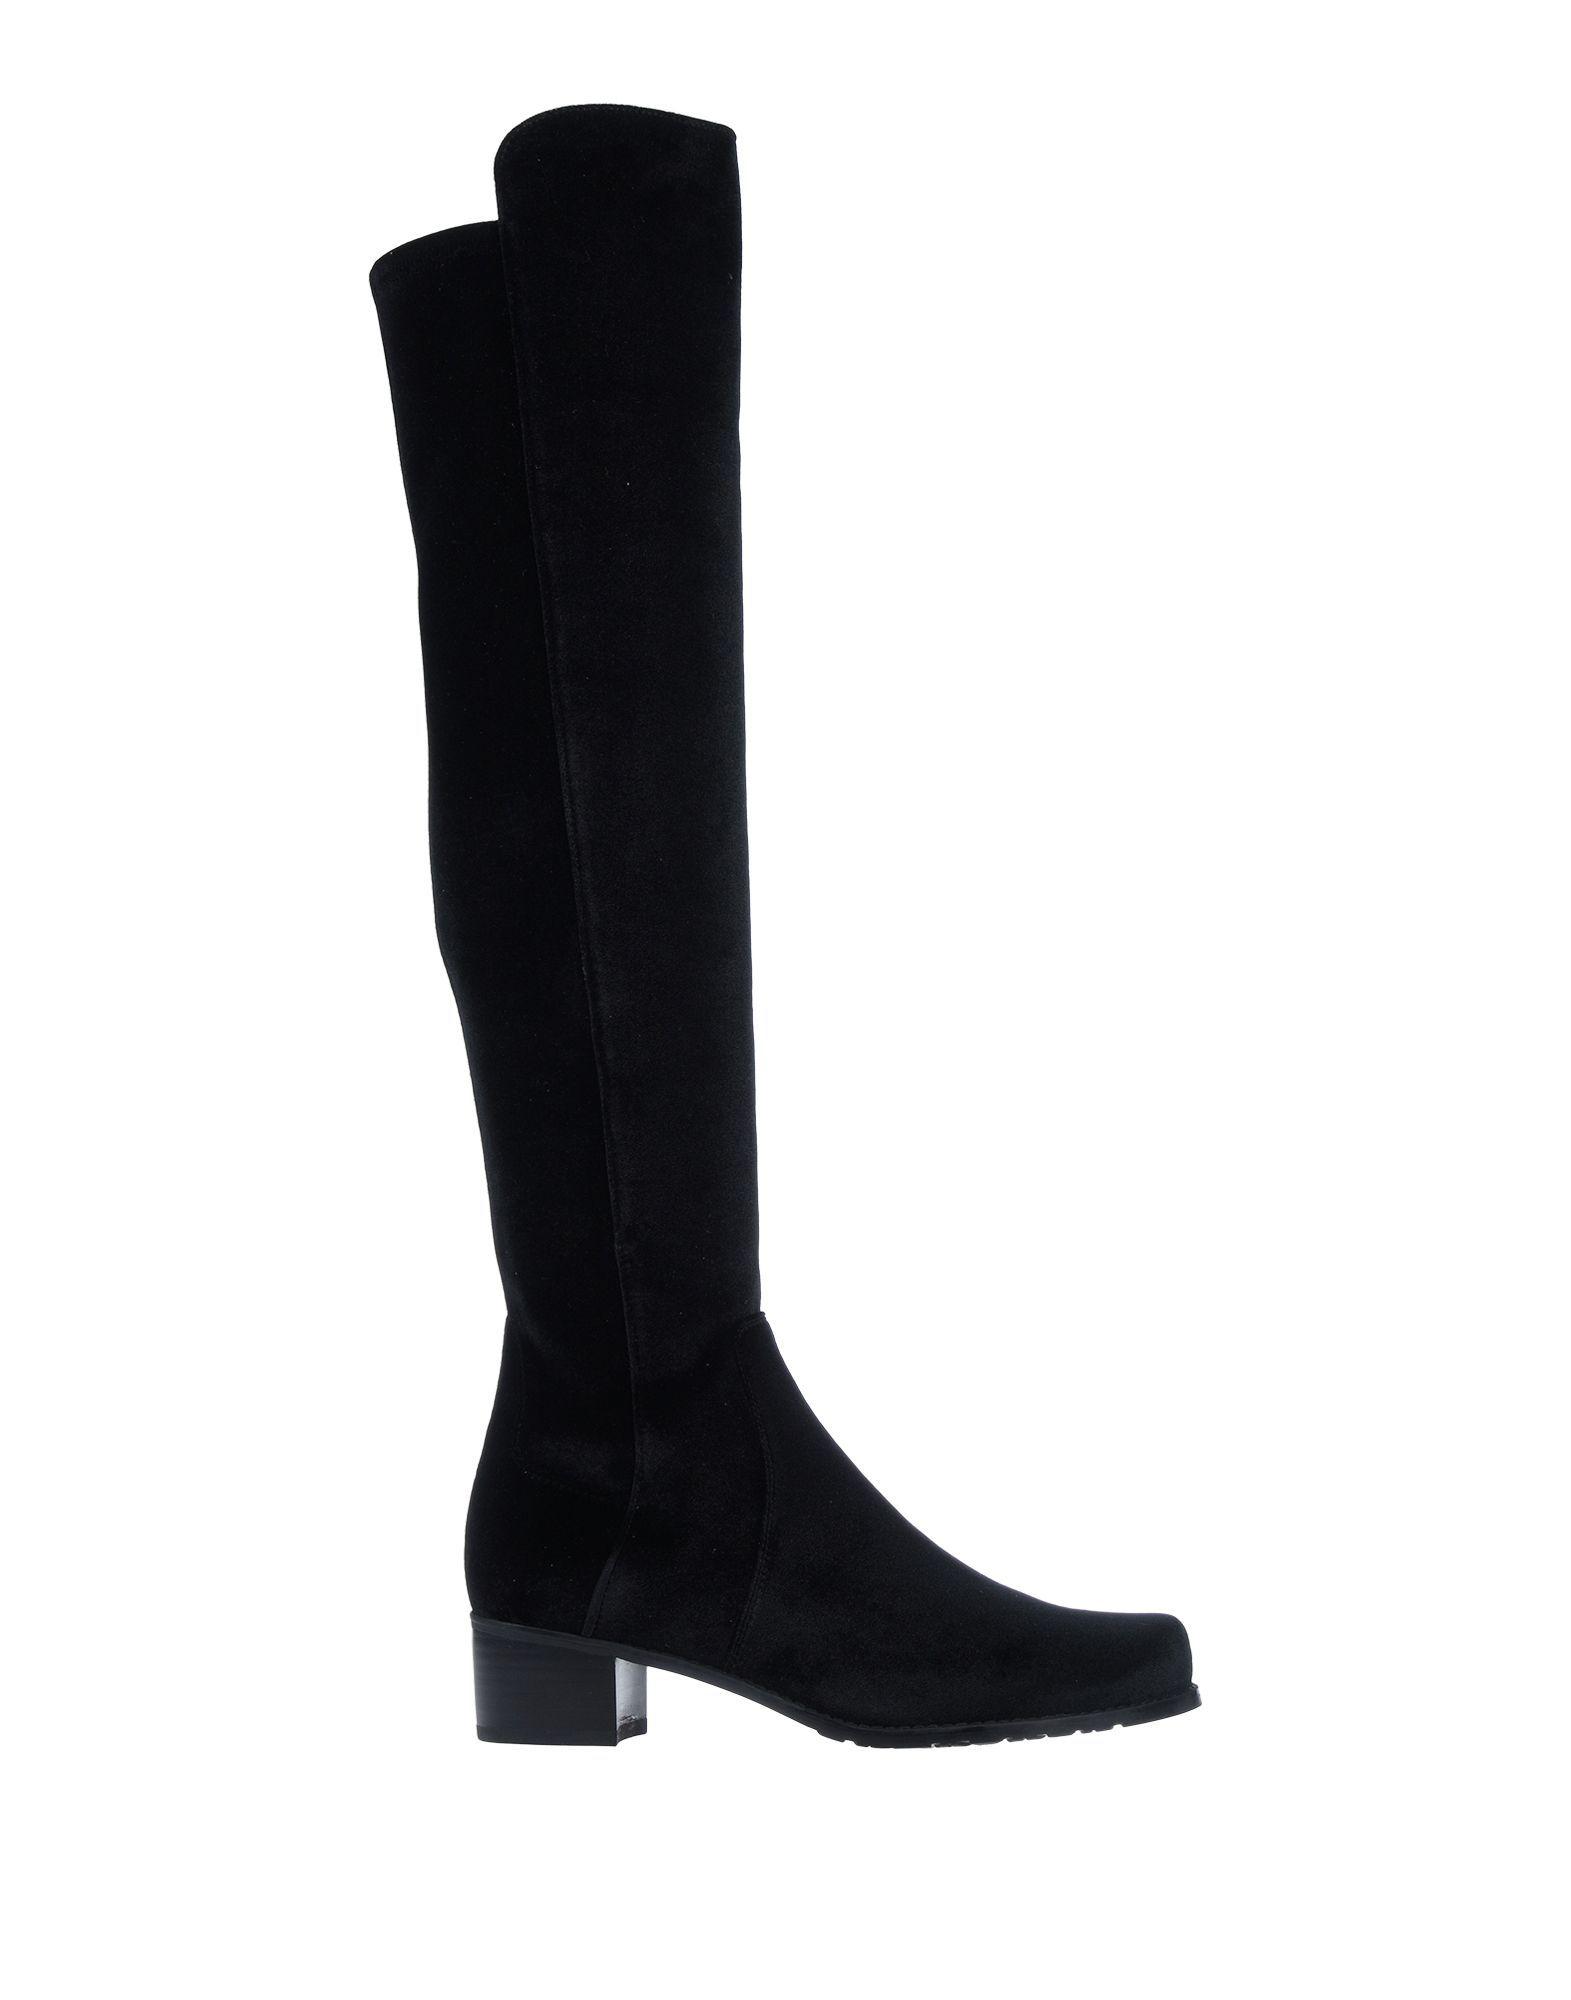 Stuart Weitzman Black Knee High Boots